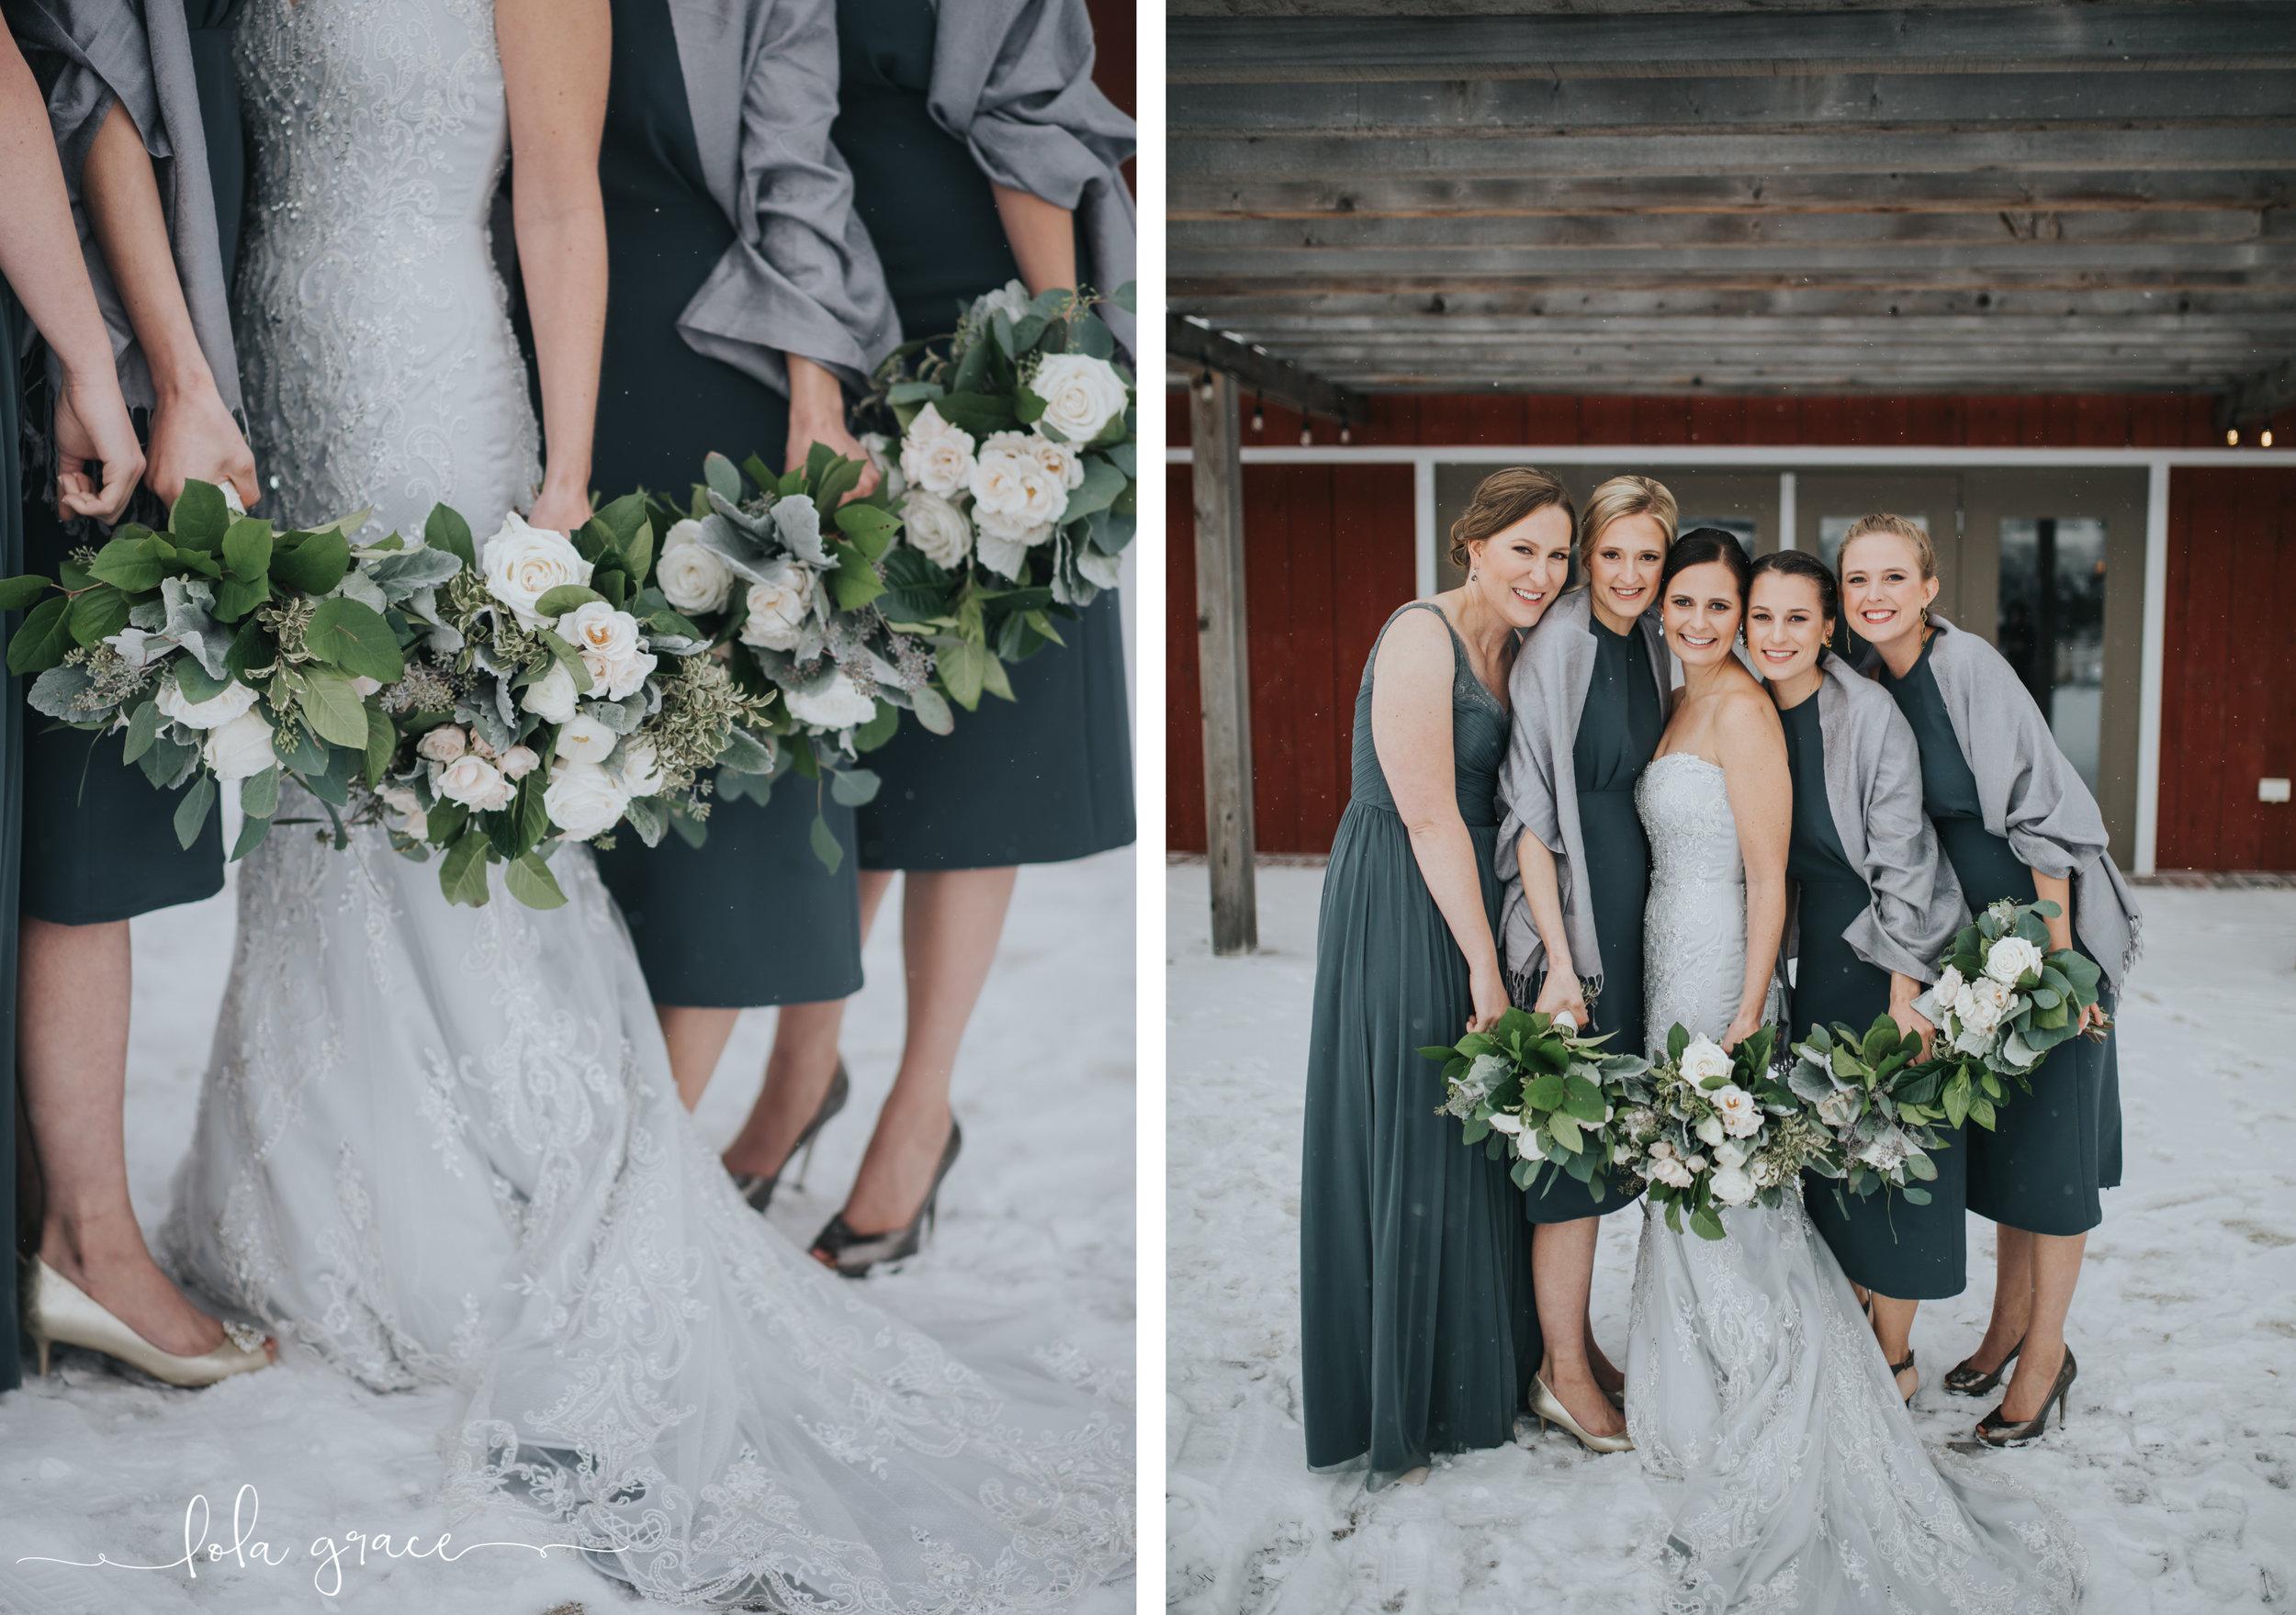 lola-grace-photography-michigan-winter-wedding-cornman-farms-41.jpg